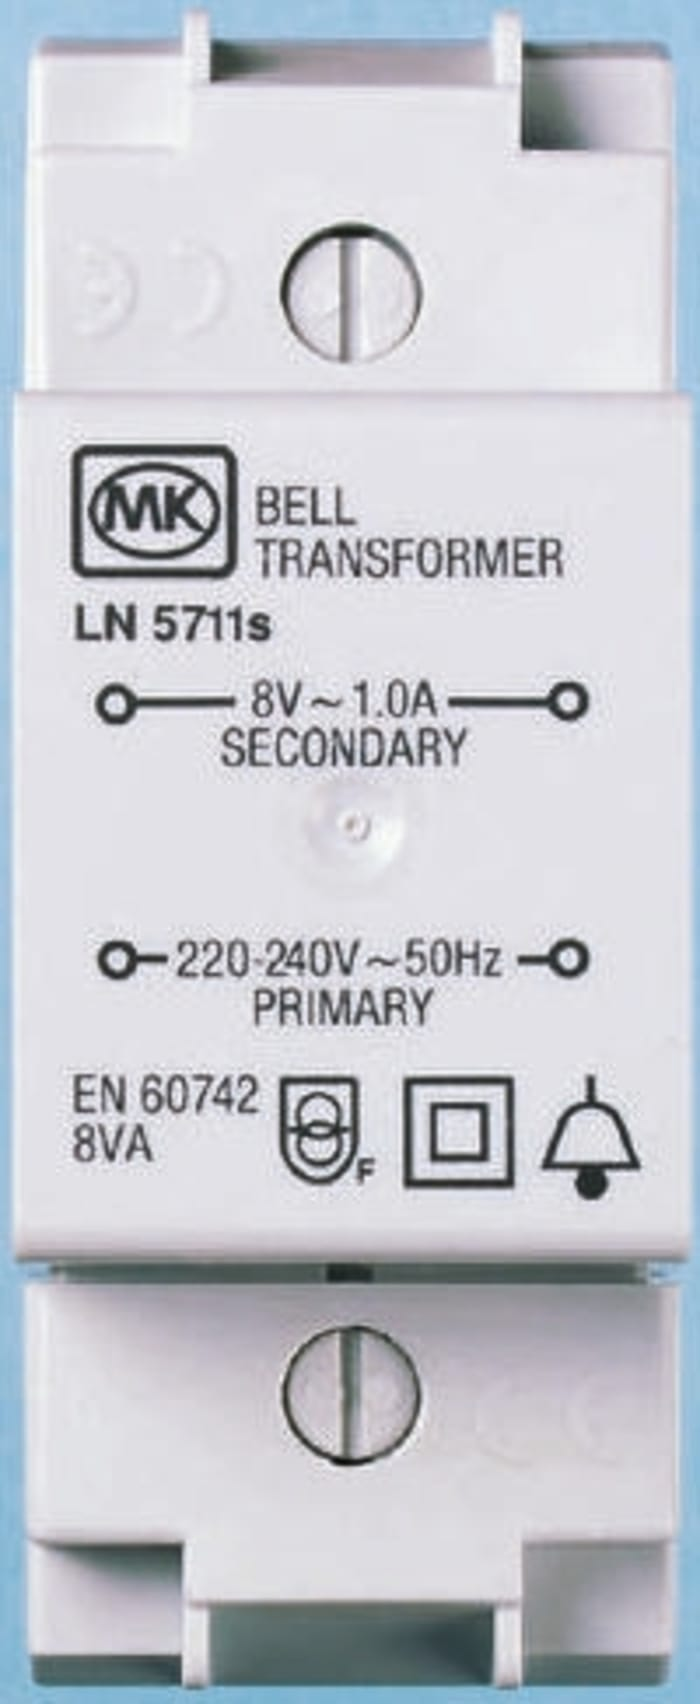 5711s Mk Mk 8va Din Rail Panel Mount Transformer 230v Ac Primary 1 X 8v Ac Secondary 381 5861 Rs Components